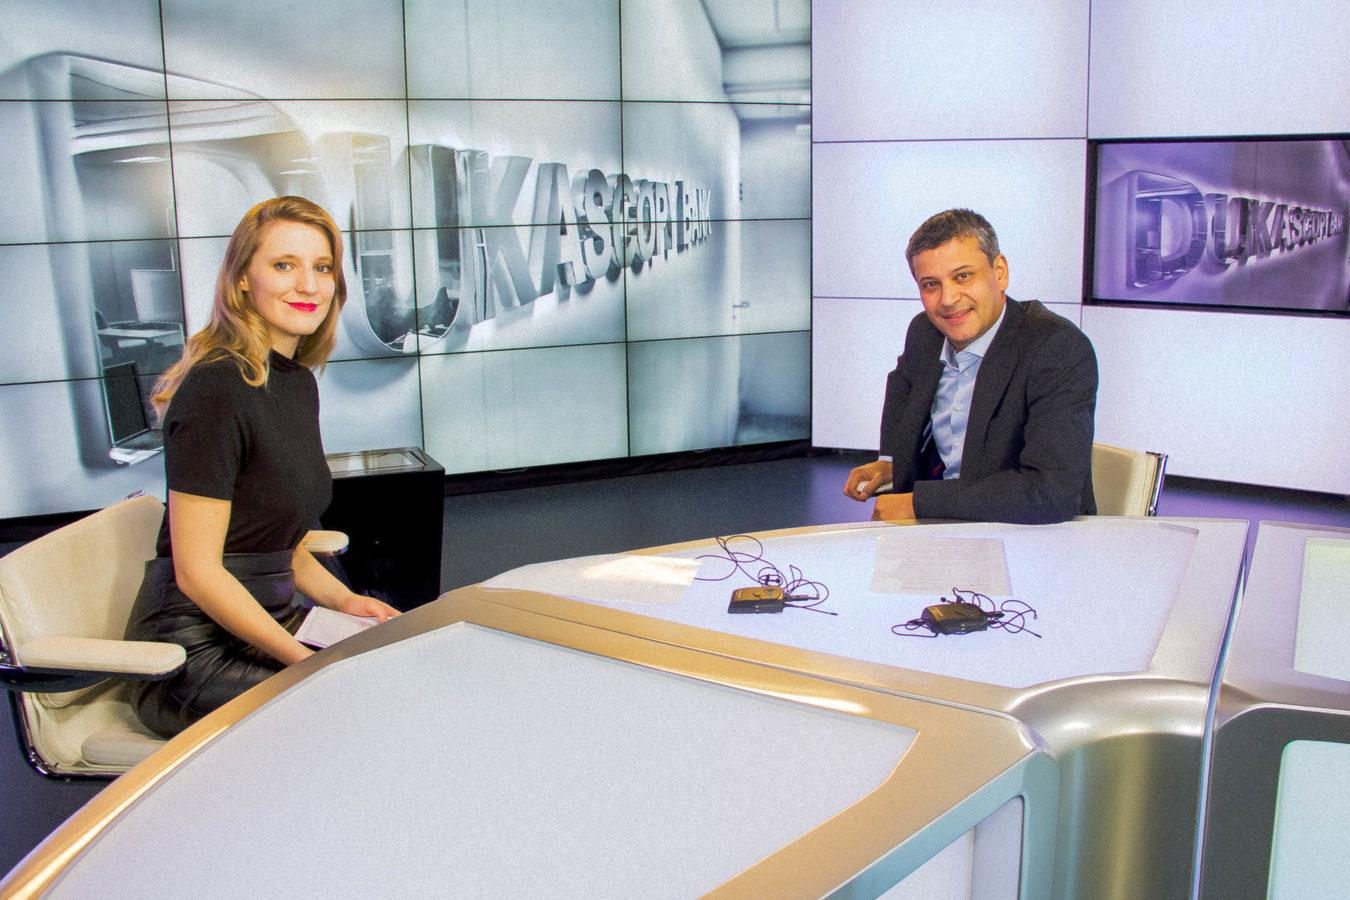 Interview de Khaled Yatouji: «La Suisse préfère jouer la carte du pragmatisme»